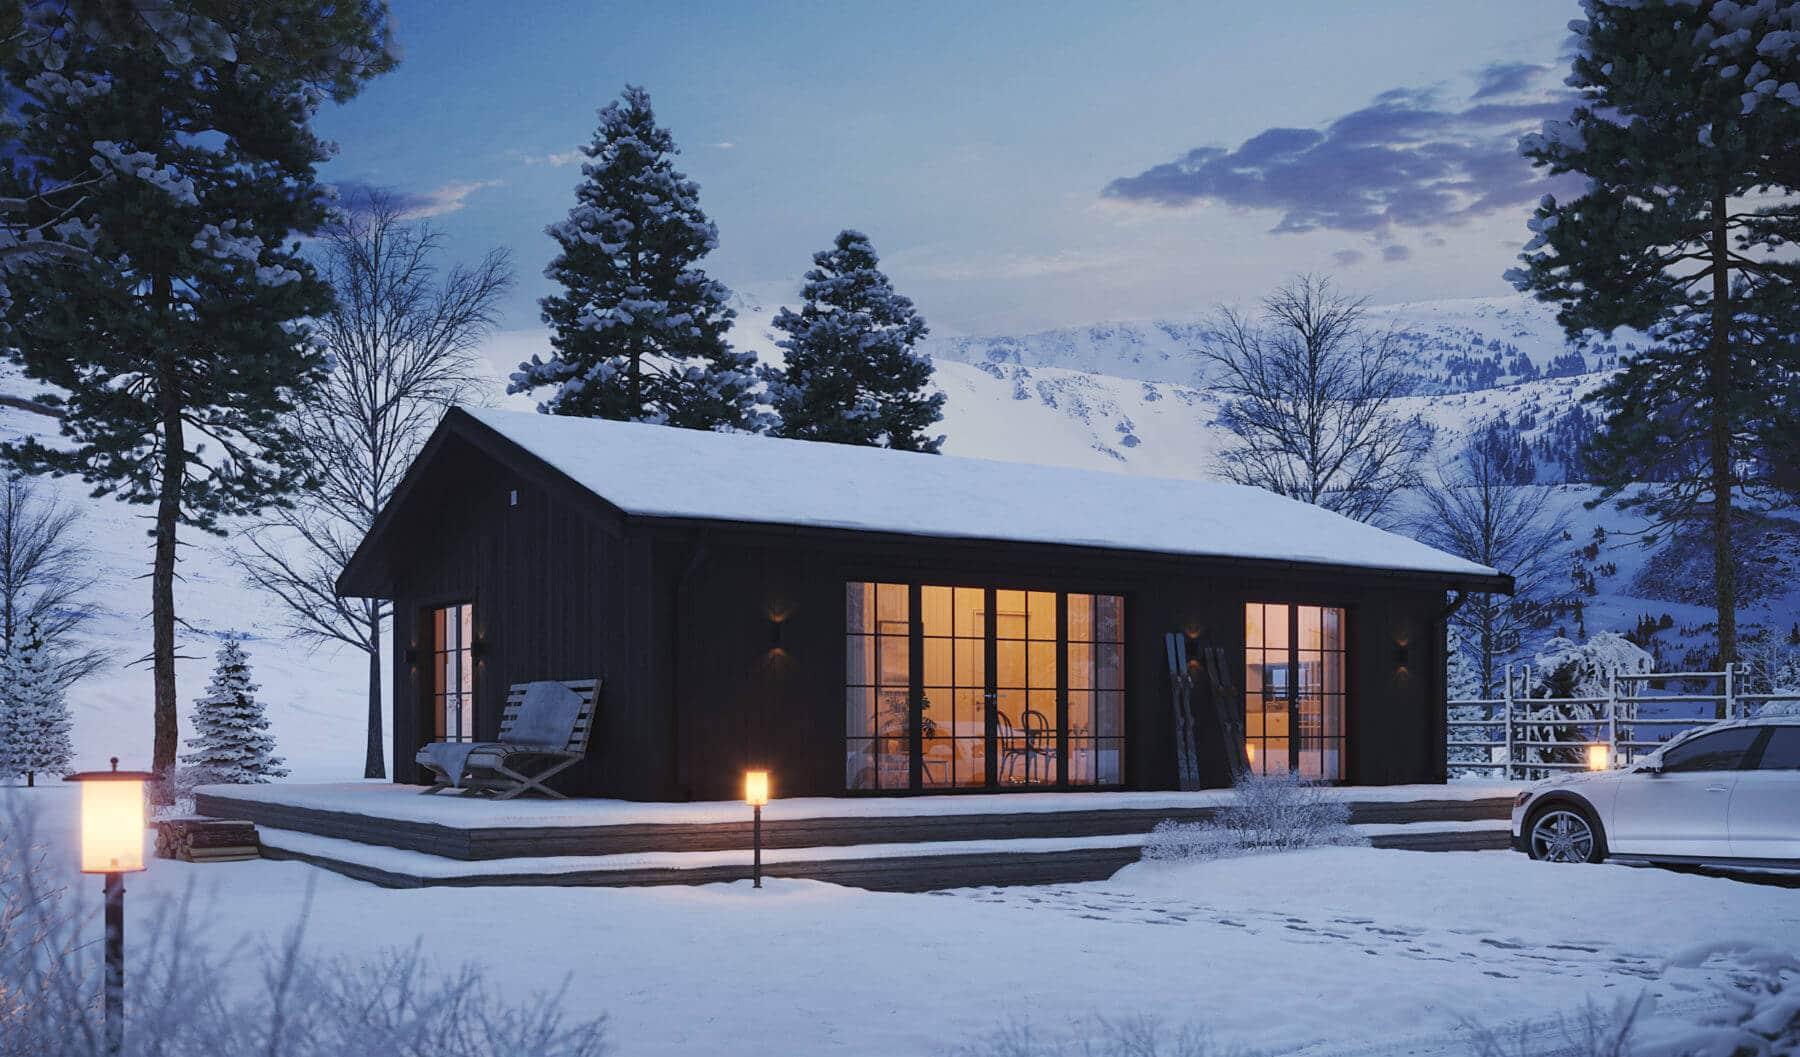 Fritidshus Klassisk 70.2 i svart fasad stående i snö under vinter